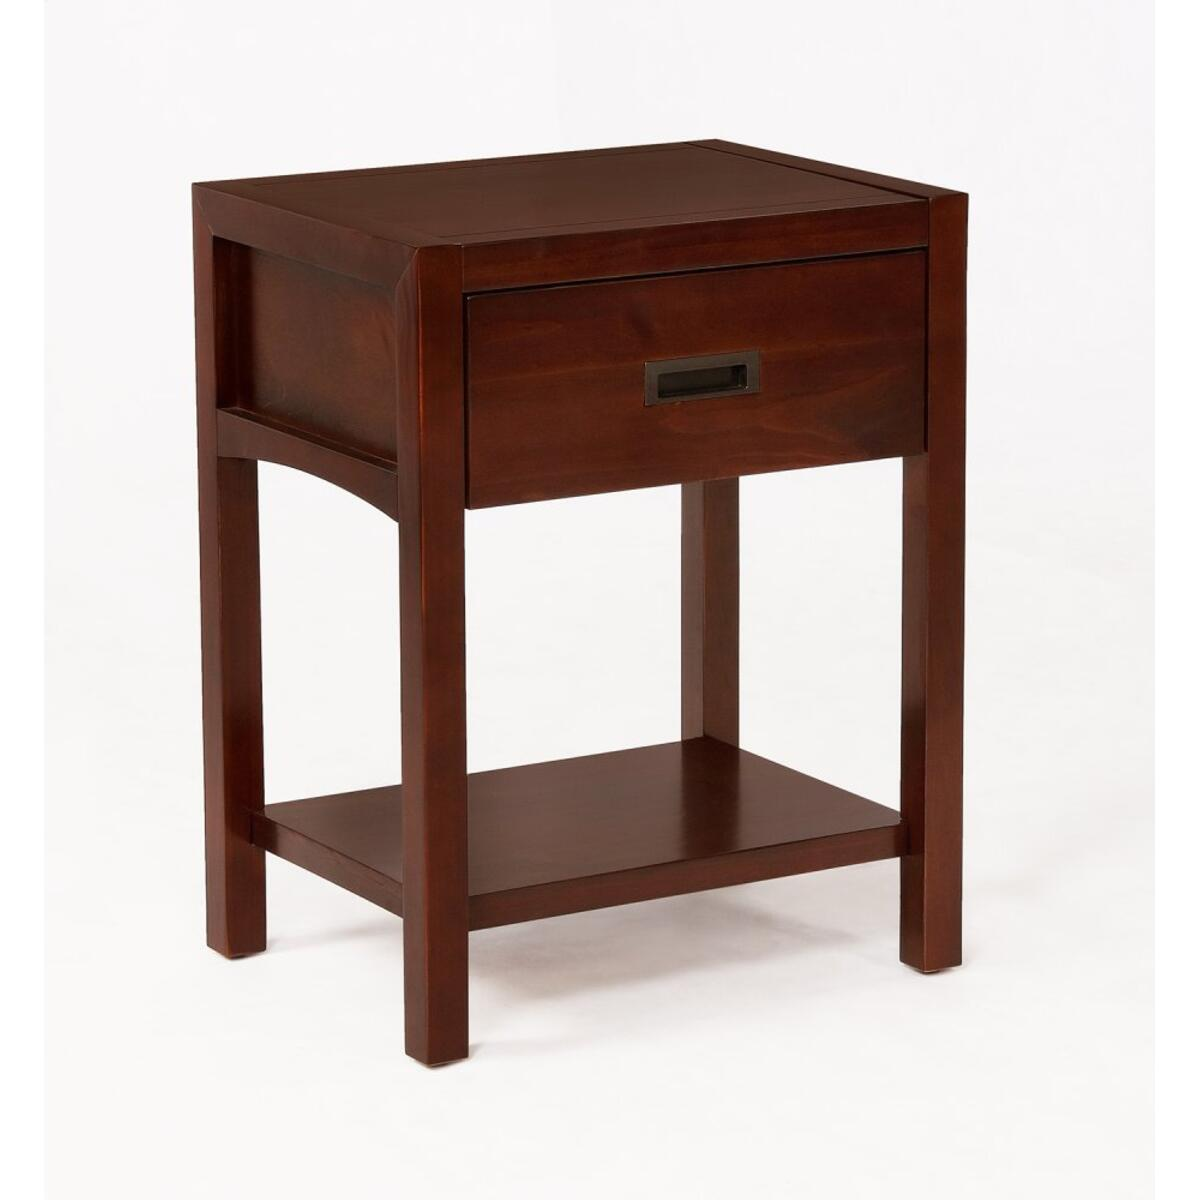 Reisa Solid Wood Night Stand - Espresso Brown